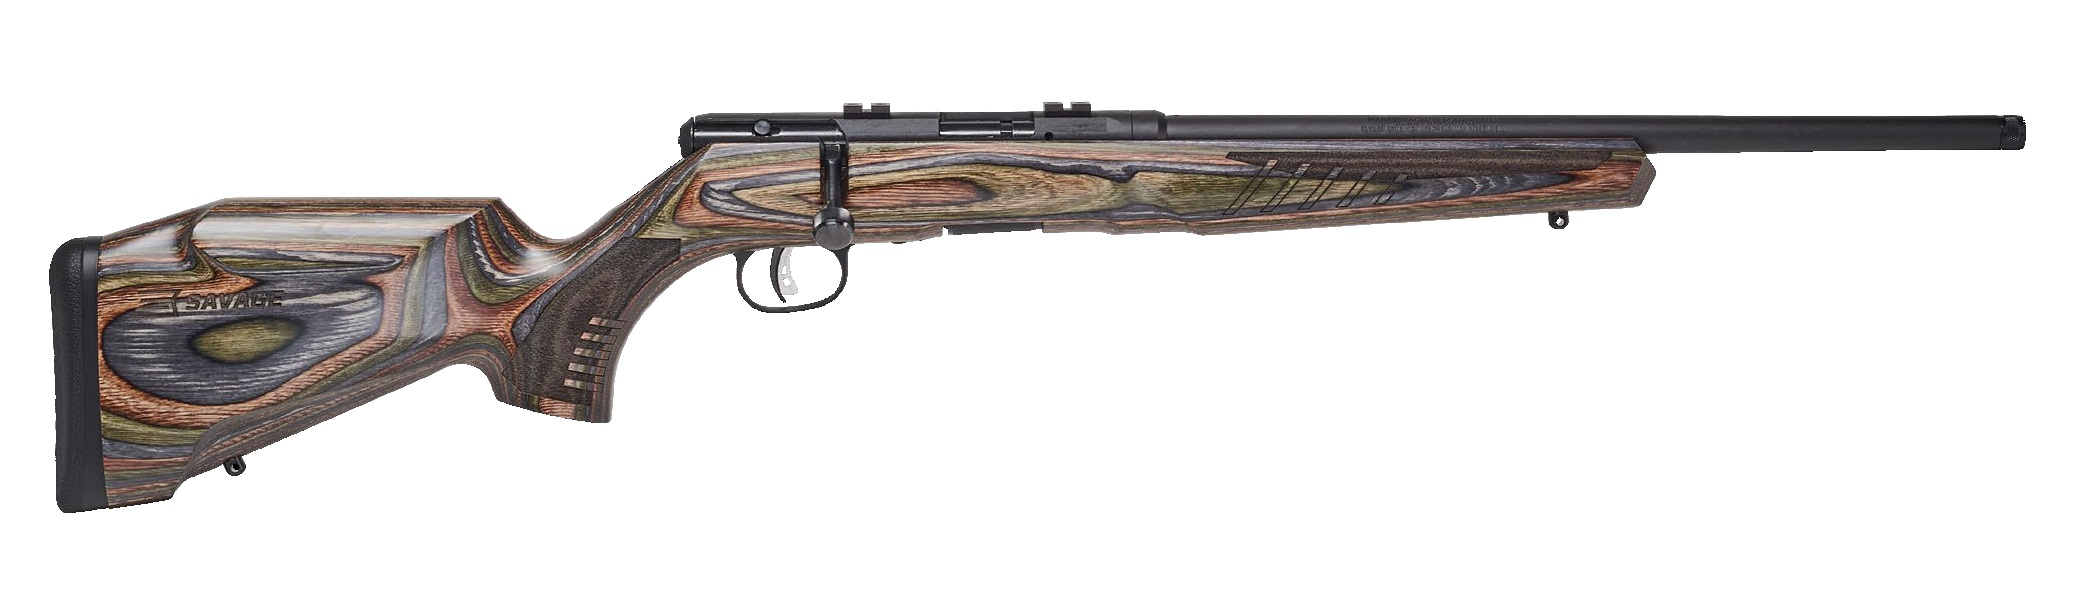 Savage Arms B22 BNS-SR 22 Magnum